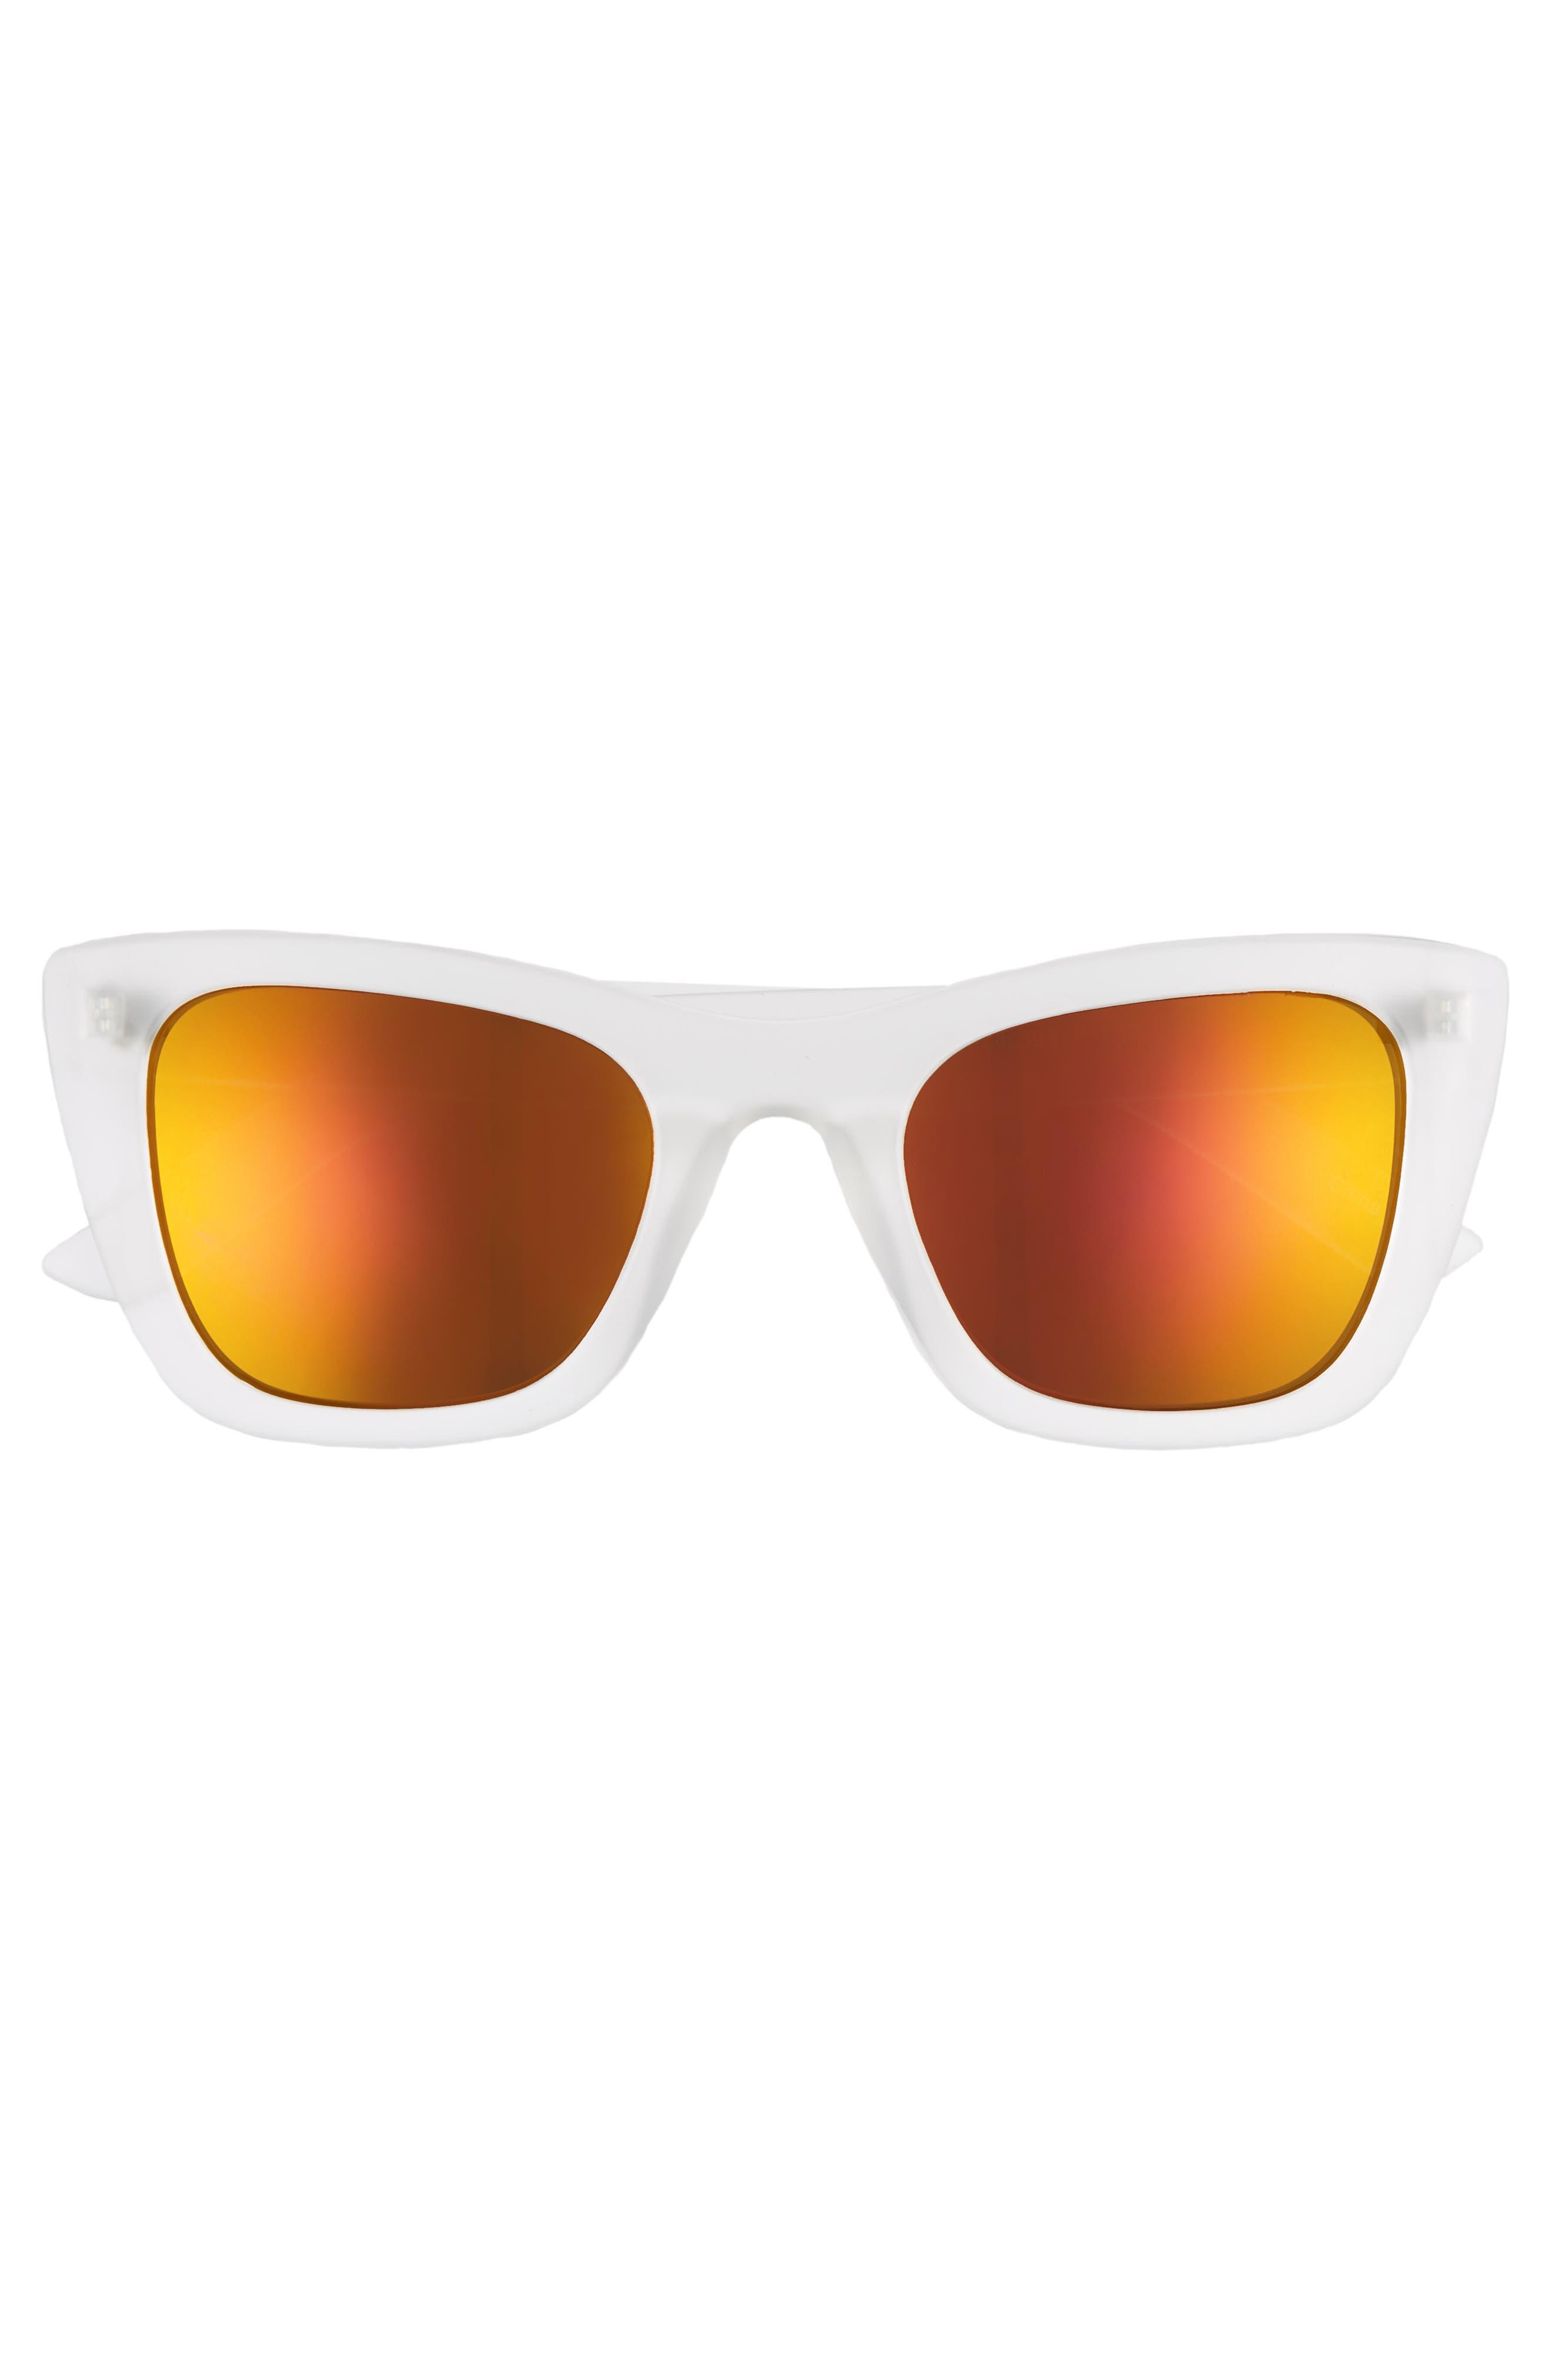 51mm Translucent Square Sunglasses,                             Alternate thumbnail 3, color,                             100